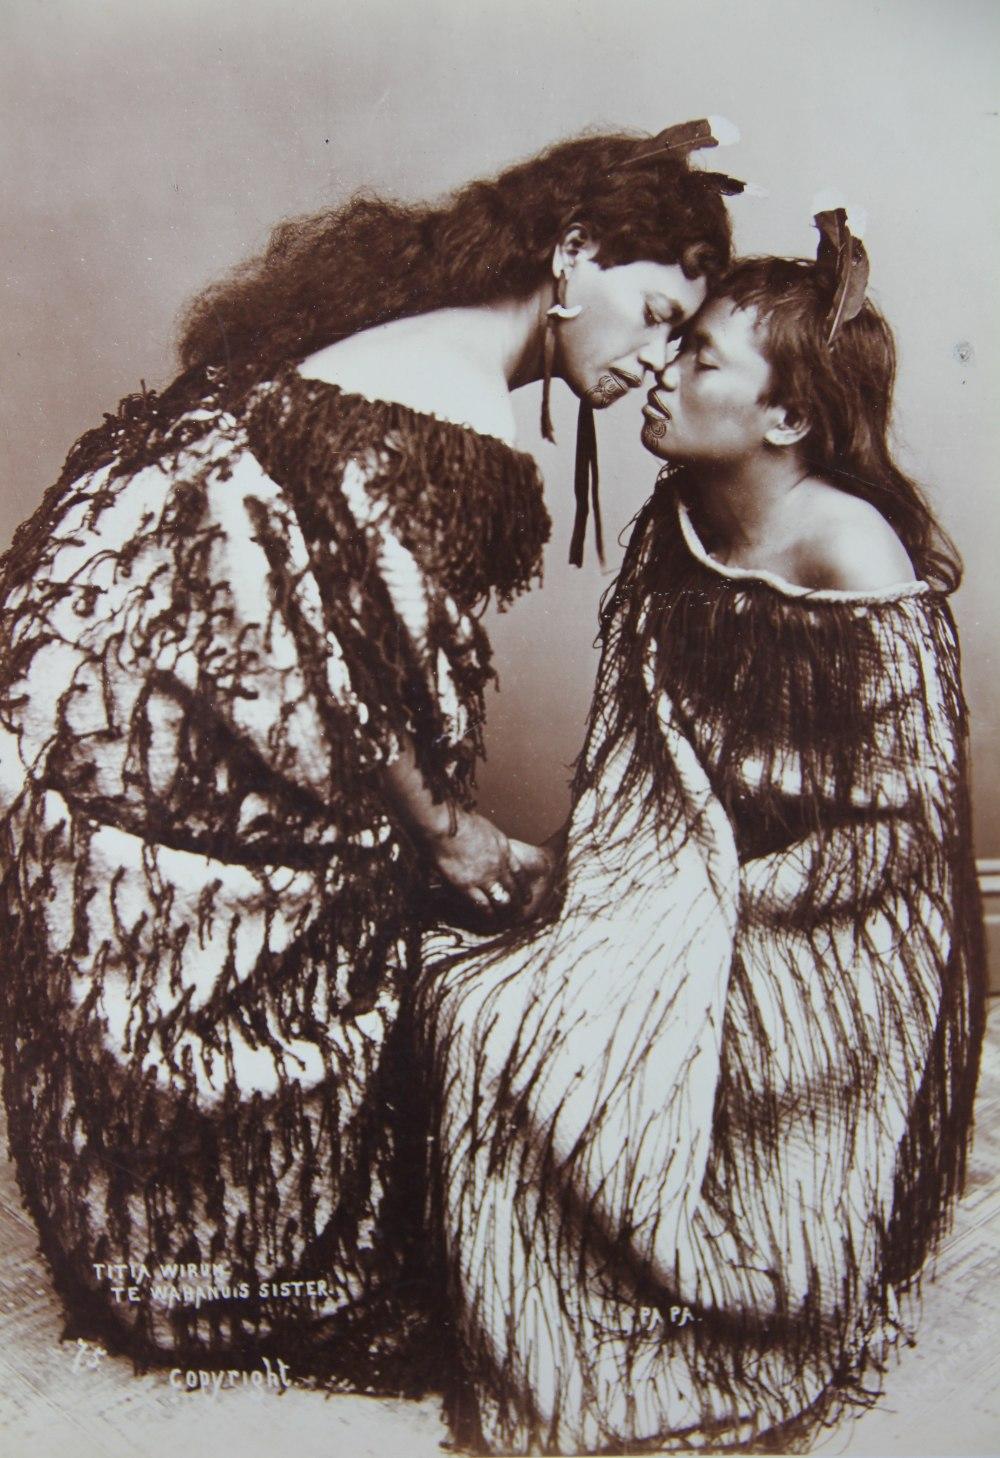 Lot 354 - Elizabeth Pulman (1836-1900), 'Tita Wirum Te Wahanuis Sisters', an albumen photograph,